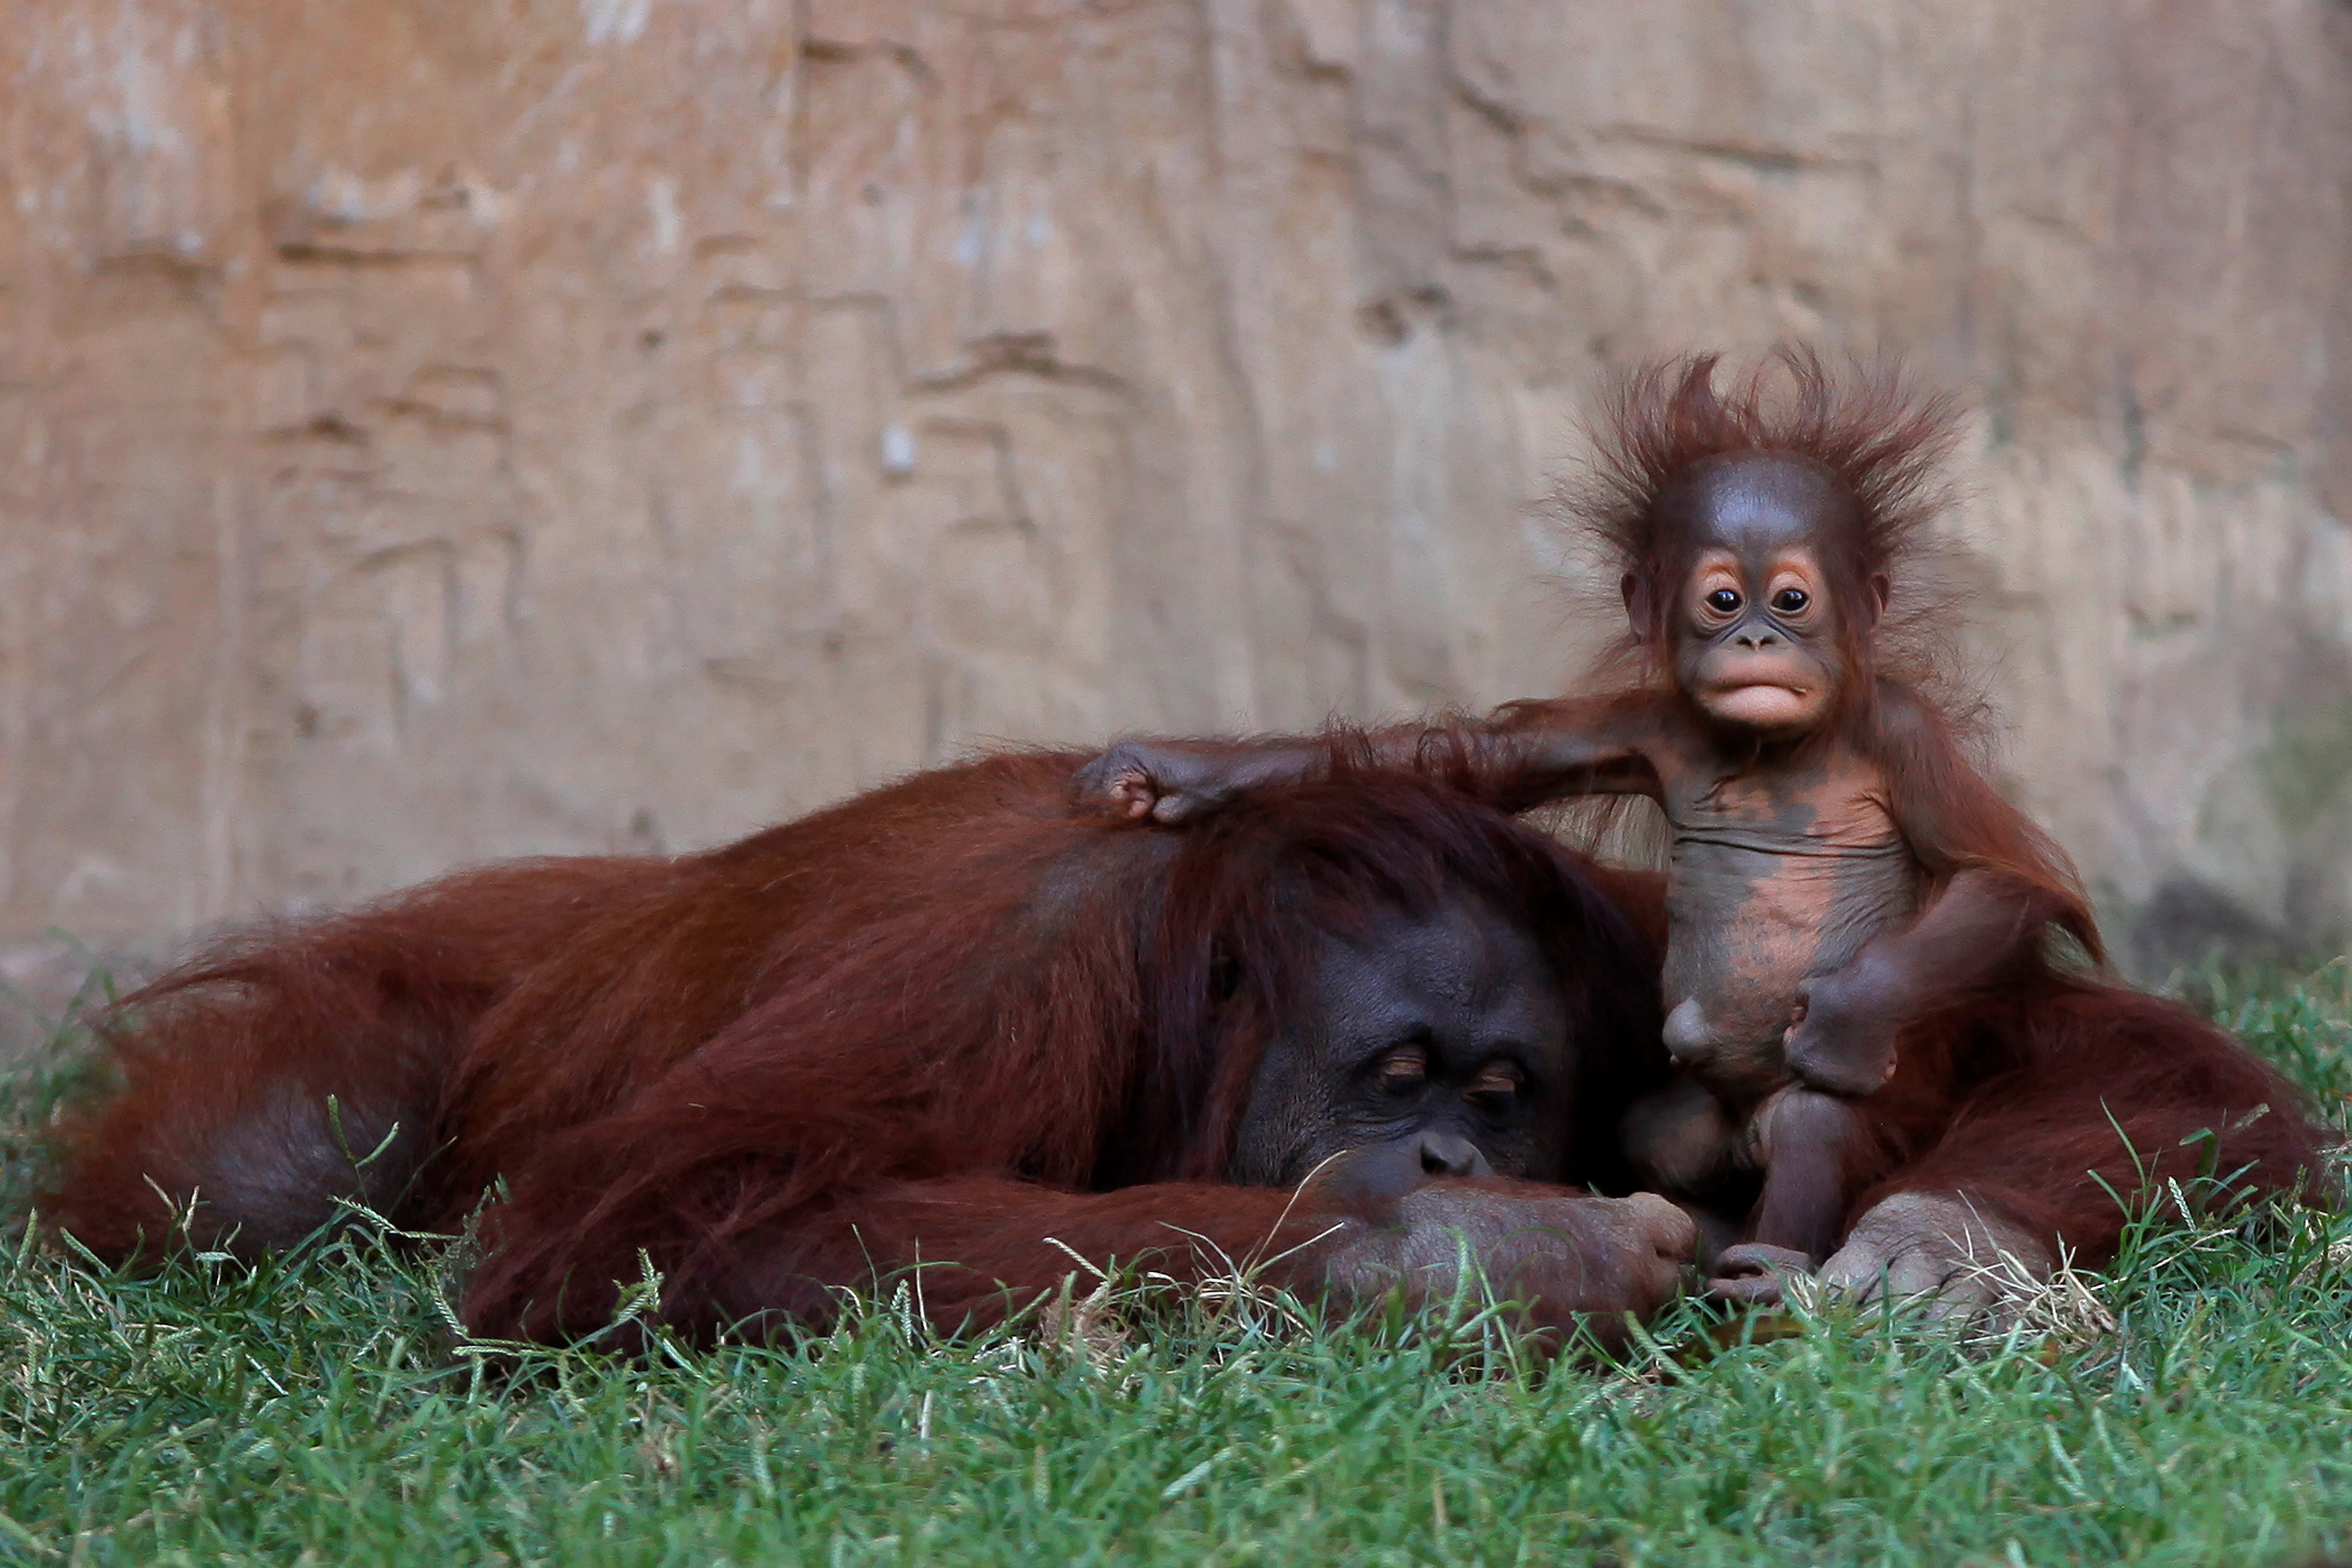 A five-month-old baby female Bornean orangutan (Pongo pygmaeus) sits on her mother Sulli at Bioparc Fuengirola in Fuengirola, near Malaga, southern Spain, September 12, 2016.  REUTERS/Jon Nazca - RTSNFLD